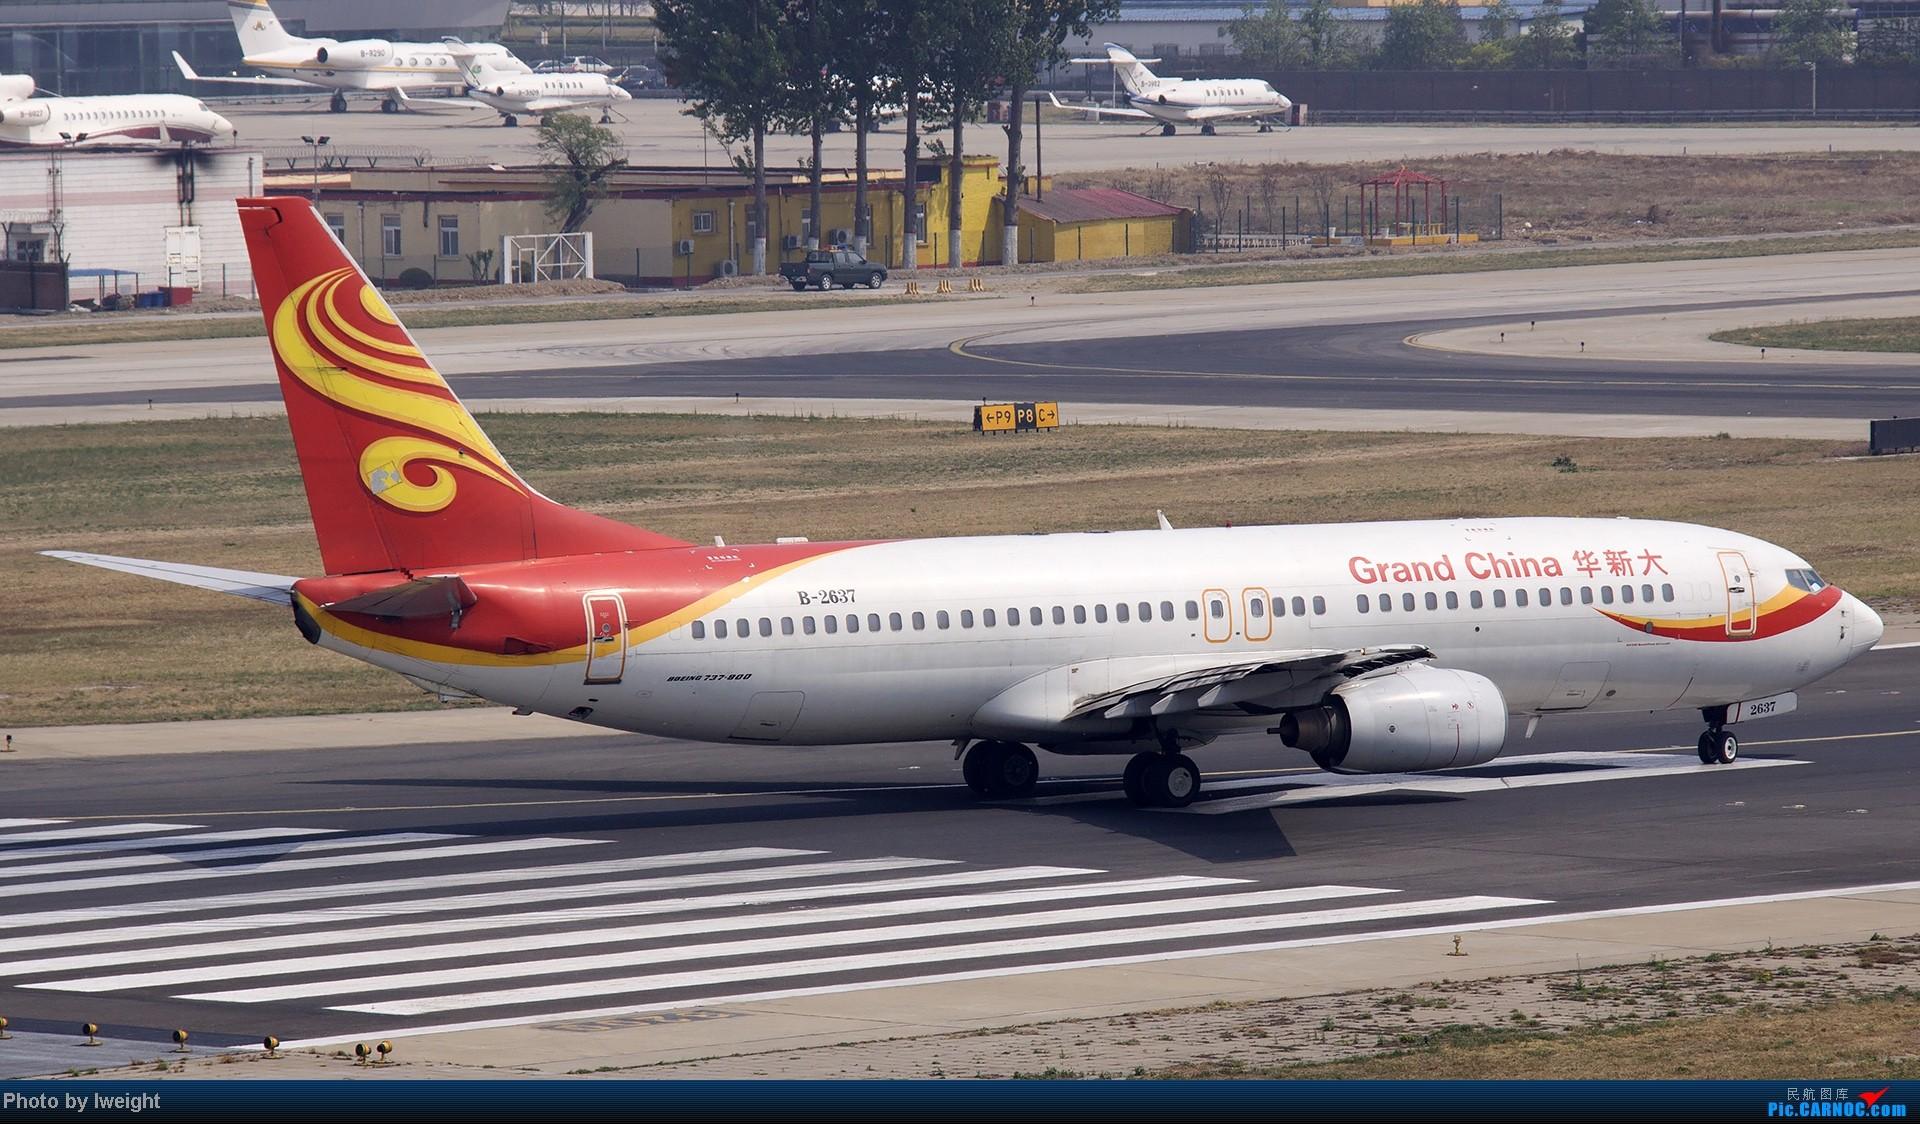 Re:[原创]错过了卡航的巴塞罗那号,只有这些大路货了,泪奔啊 BOEING 737-800 B-2637 中国北京首都机场